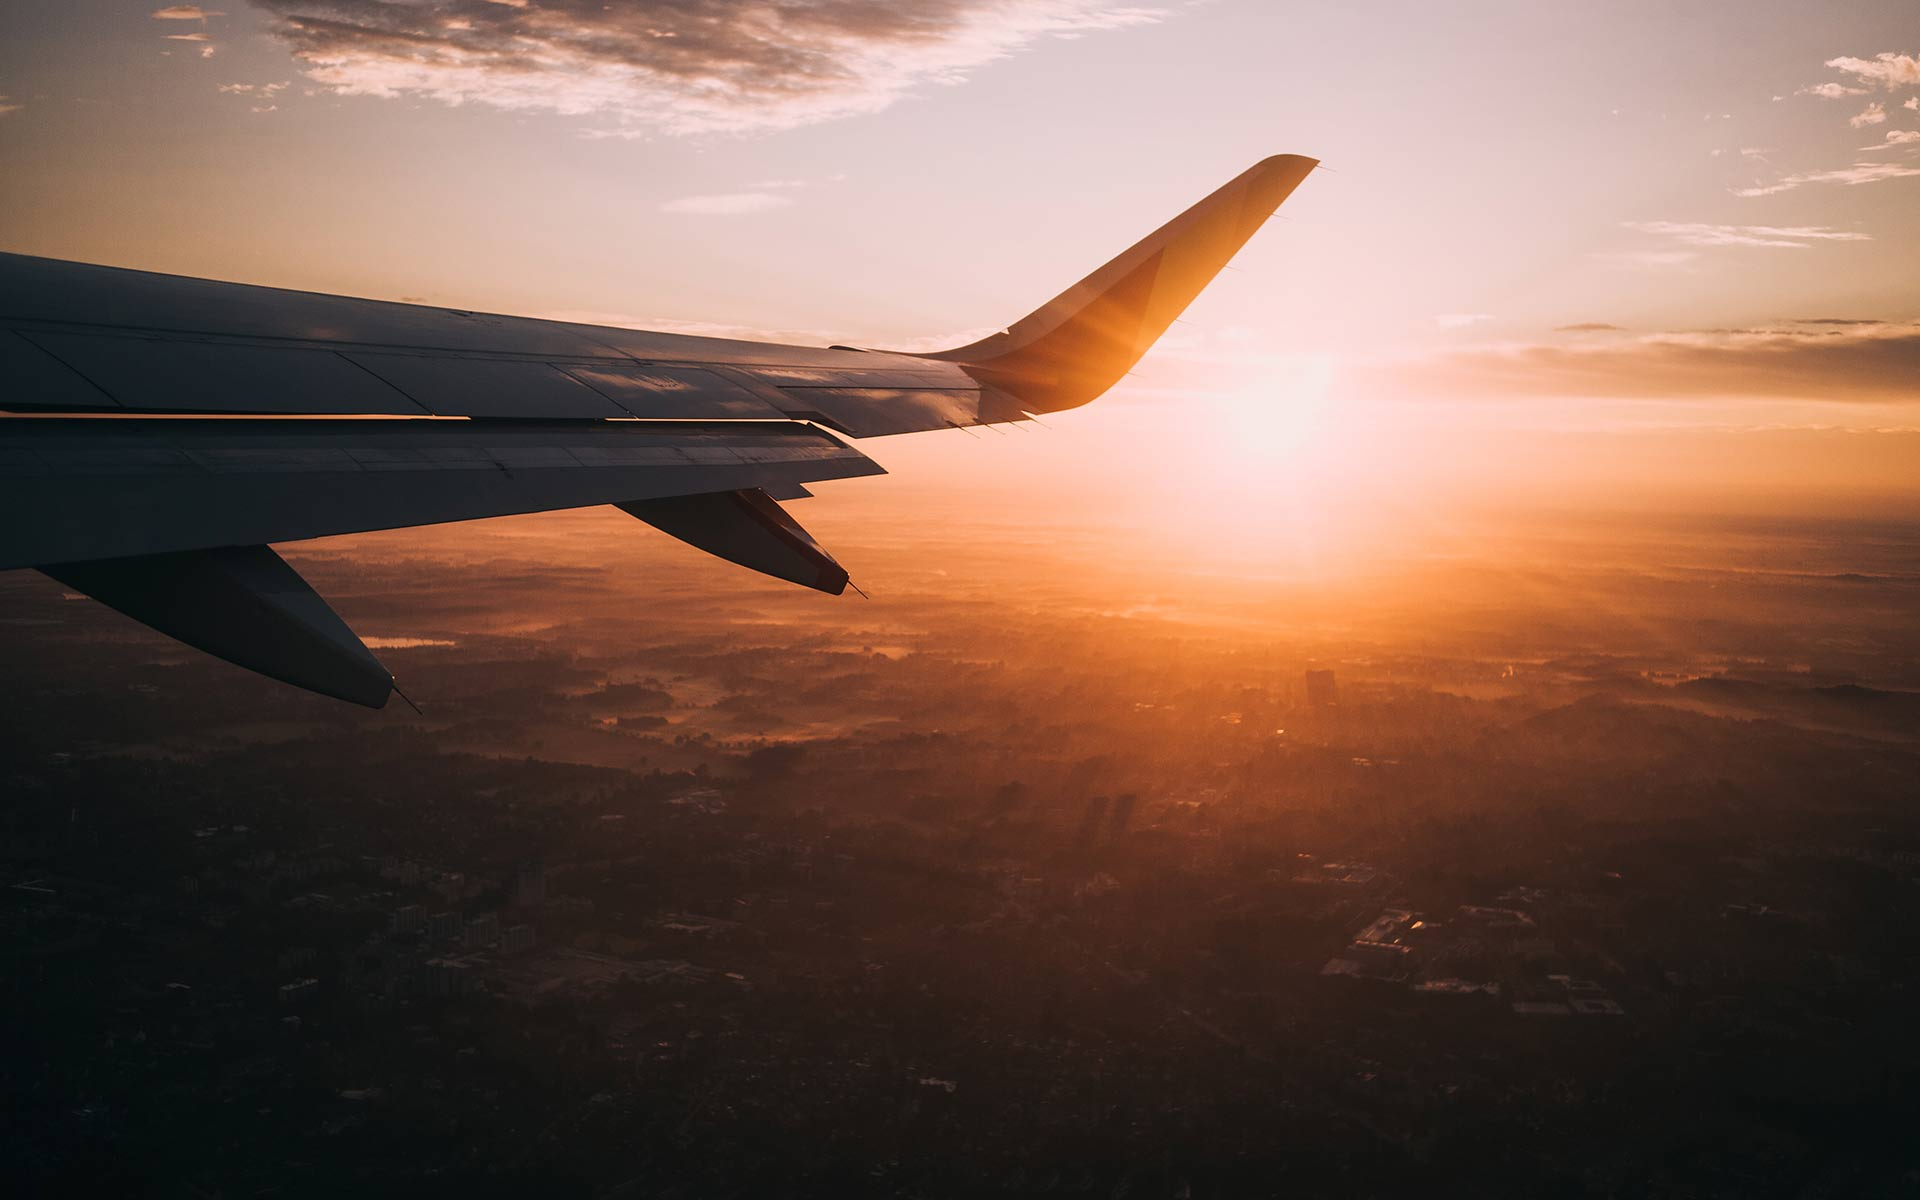 Airplane-in-Flight